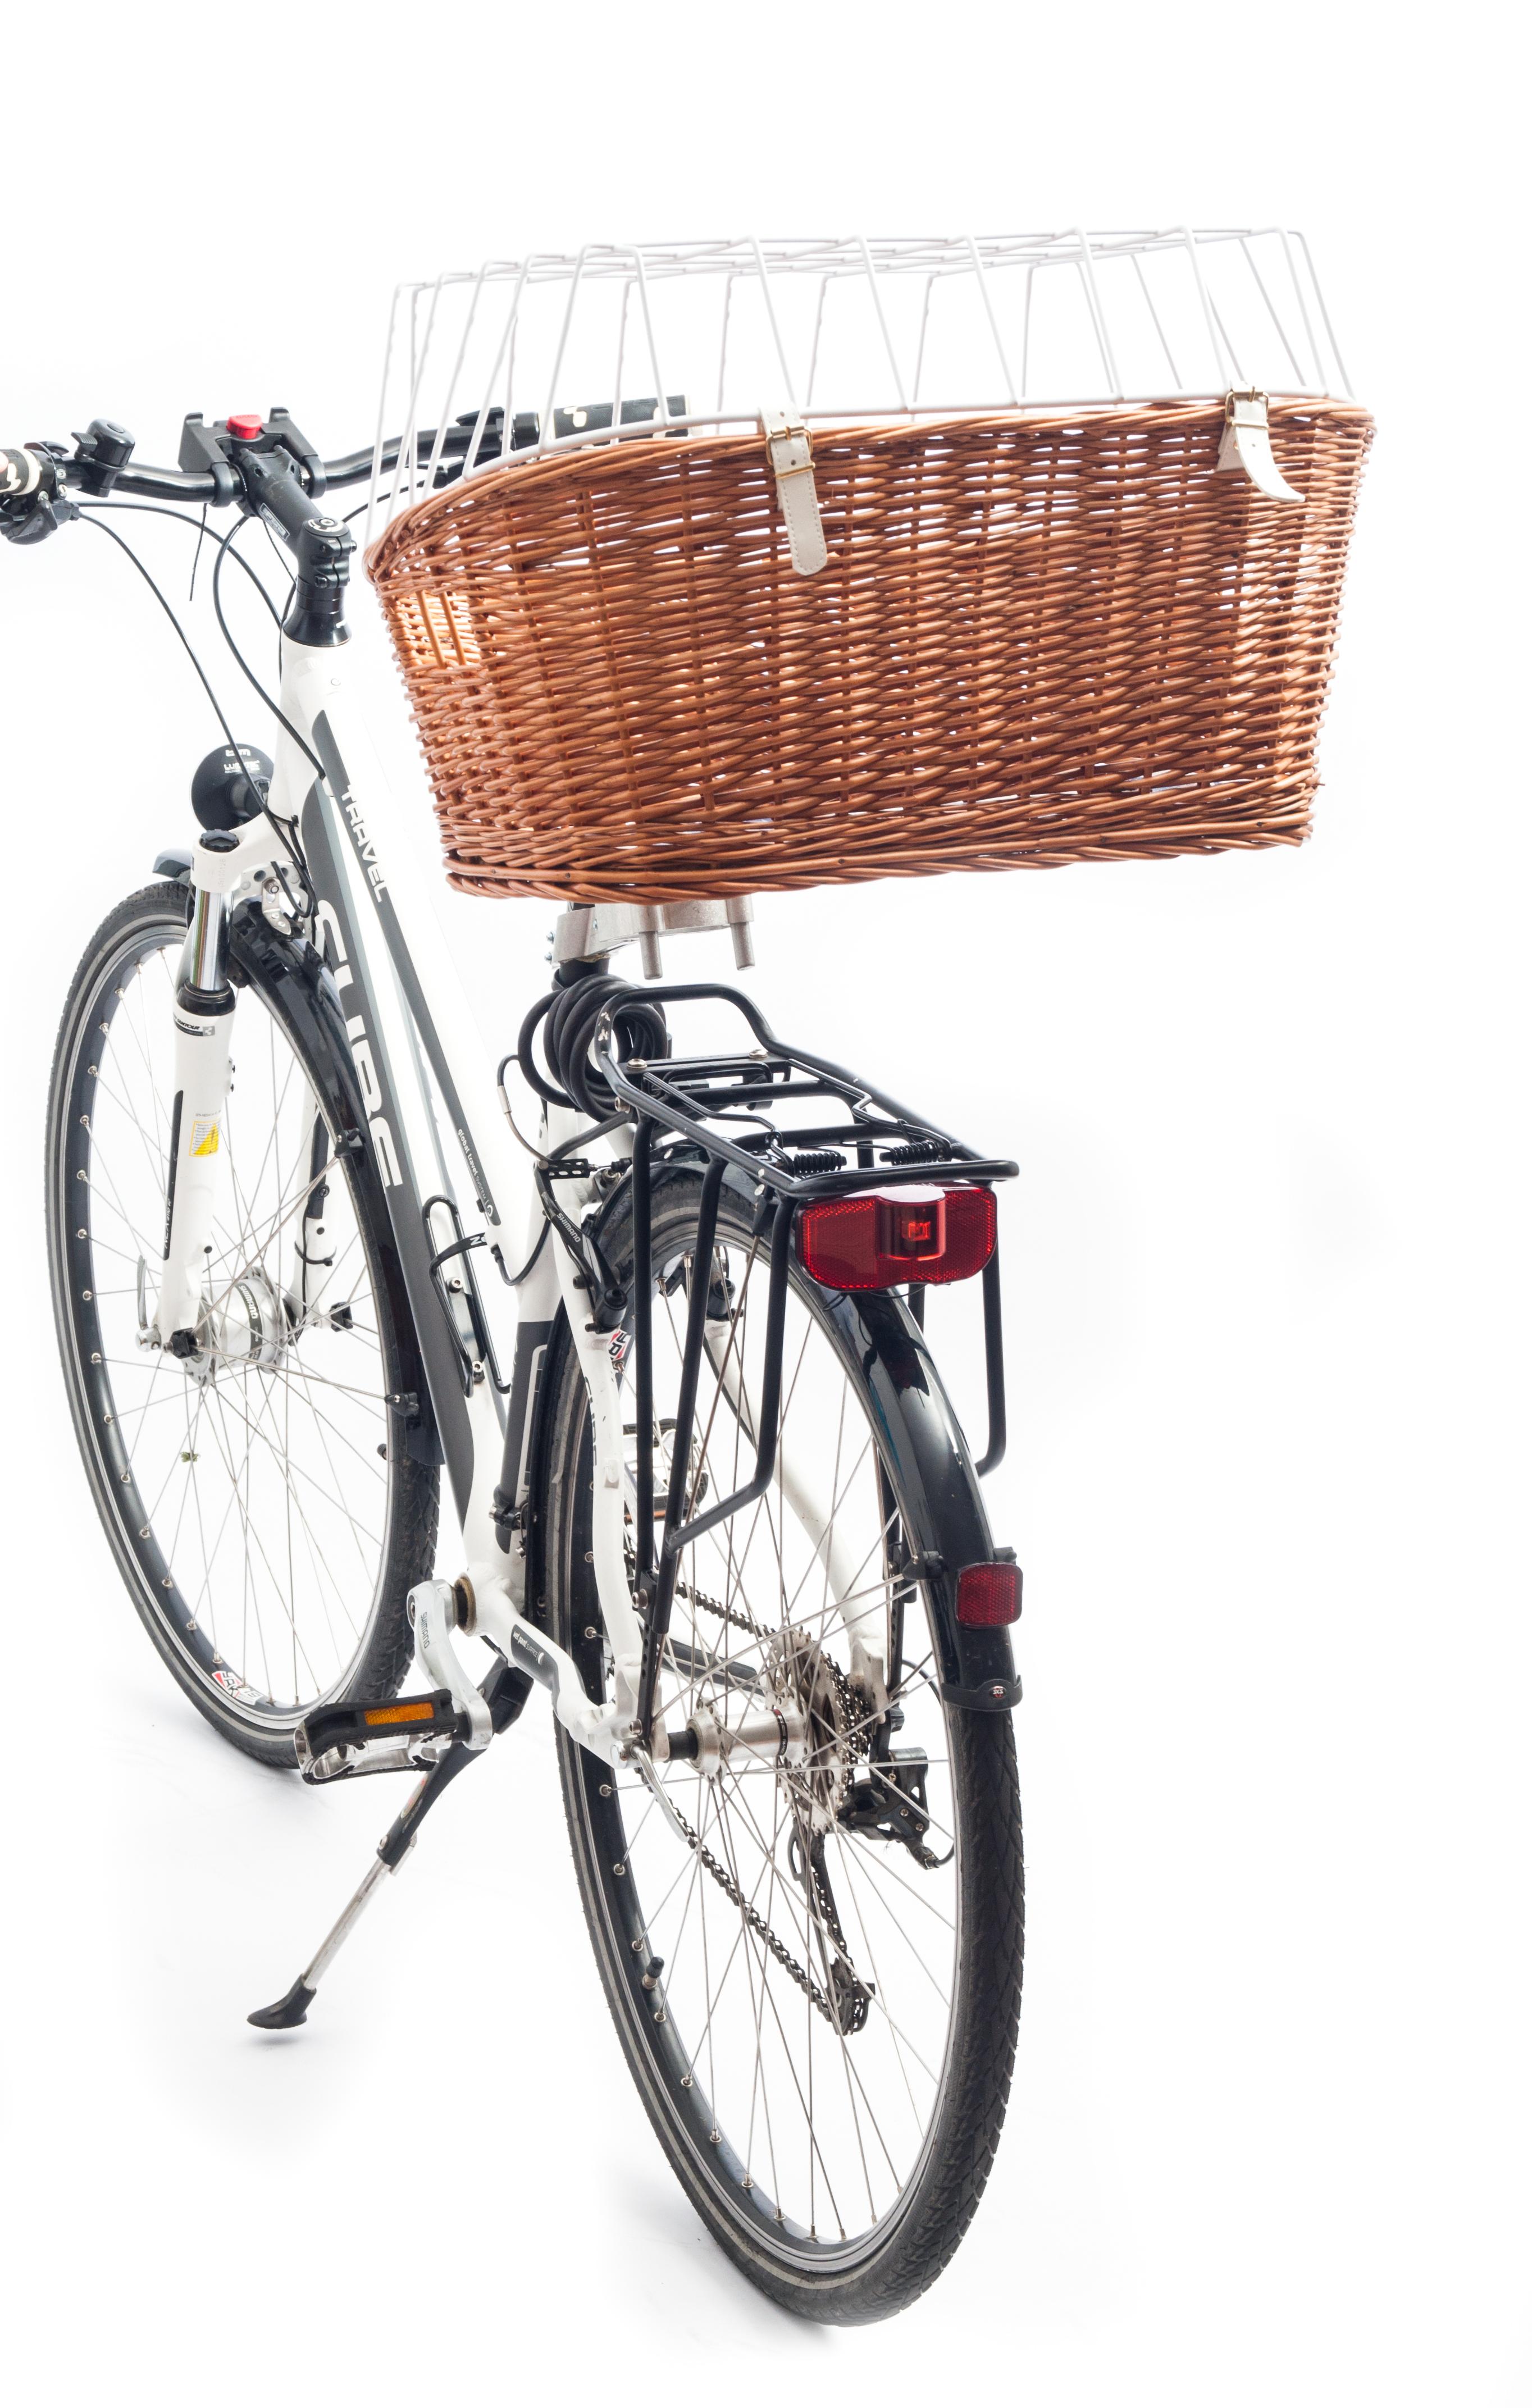 Aumüller Fahrradkorb komplett für Sattelrohrmontage